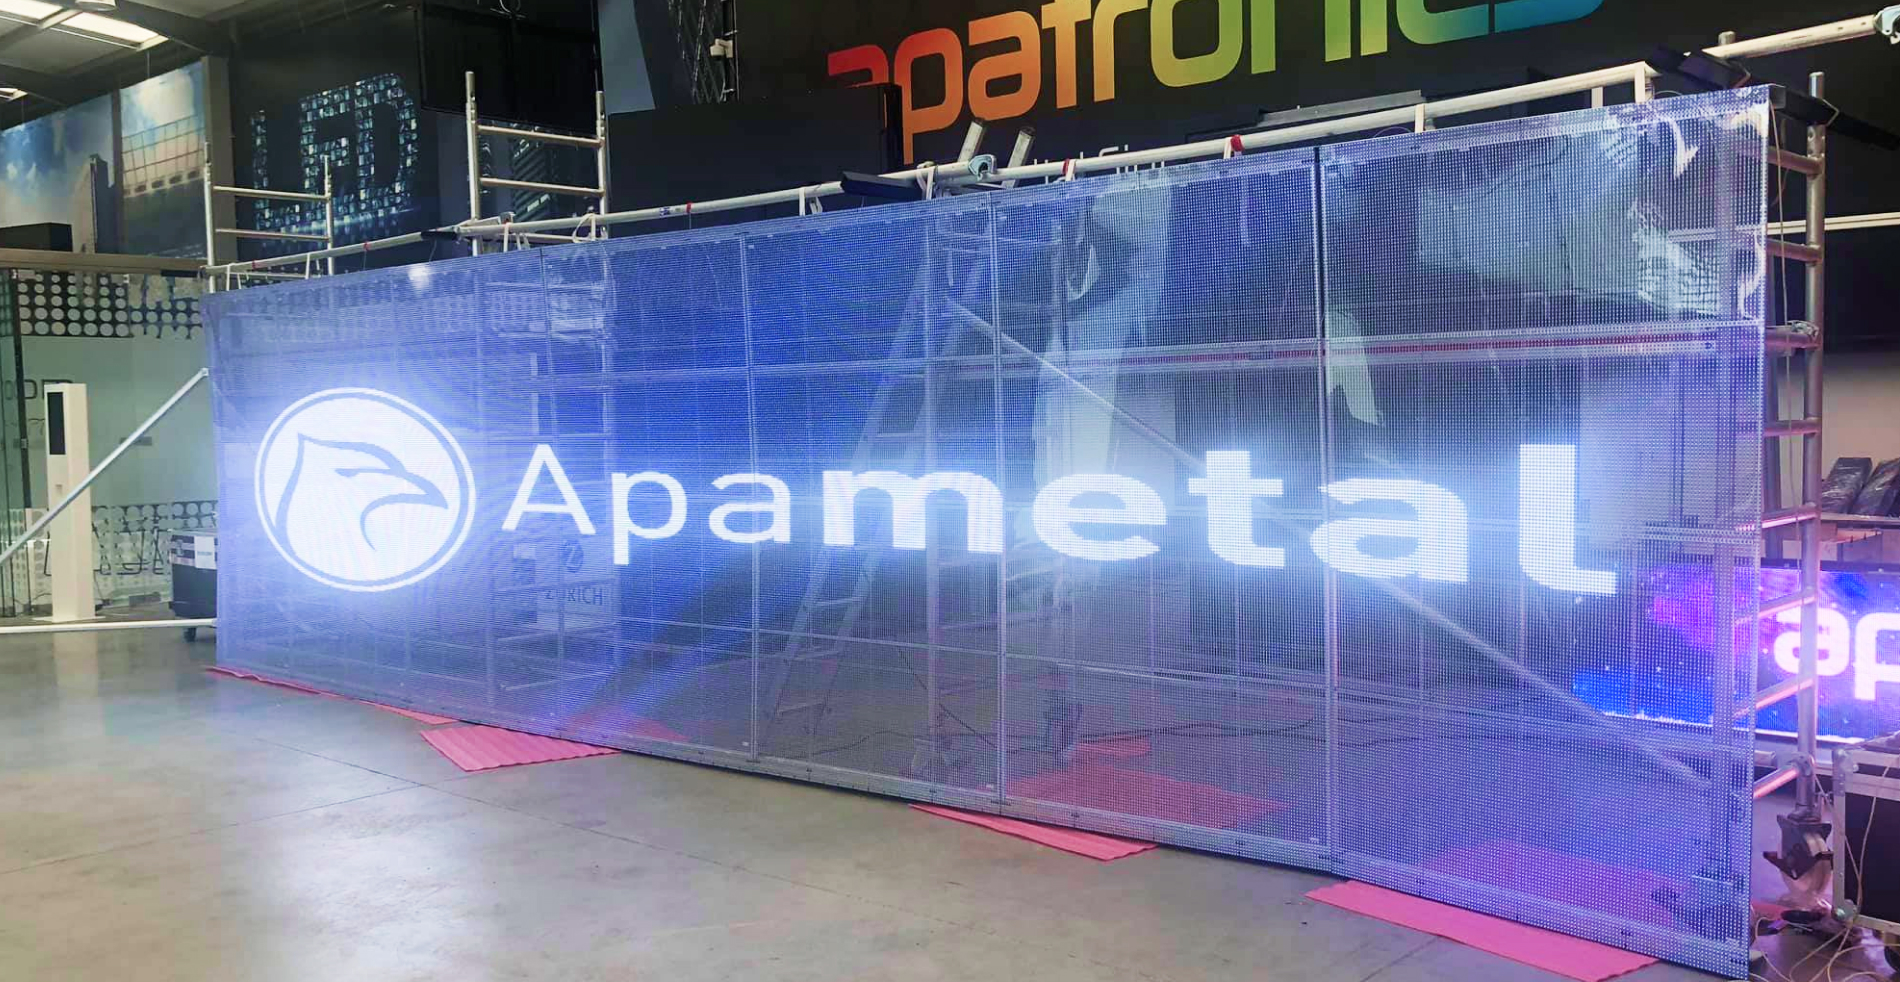 Painel Led Transparent Series 8640mm x 2240mm SMD10 High Brightness (5500 nits) da Apatronics